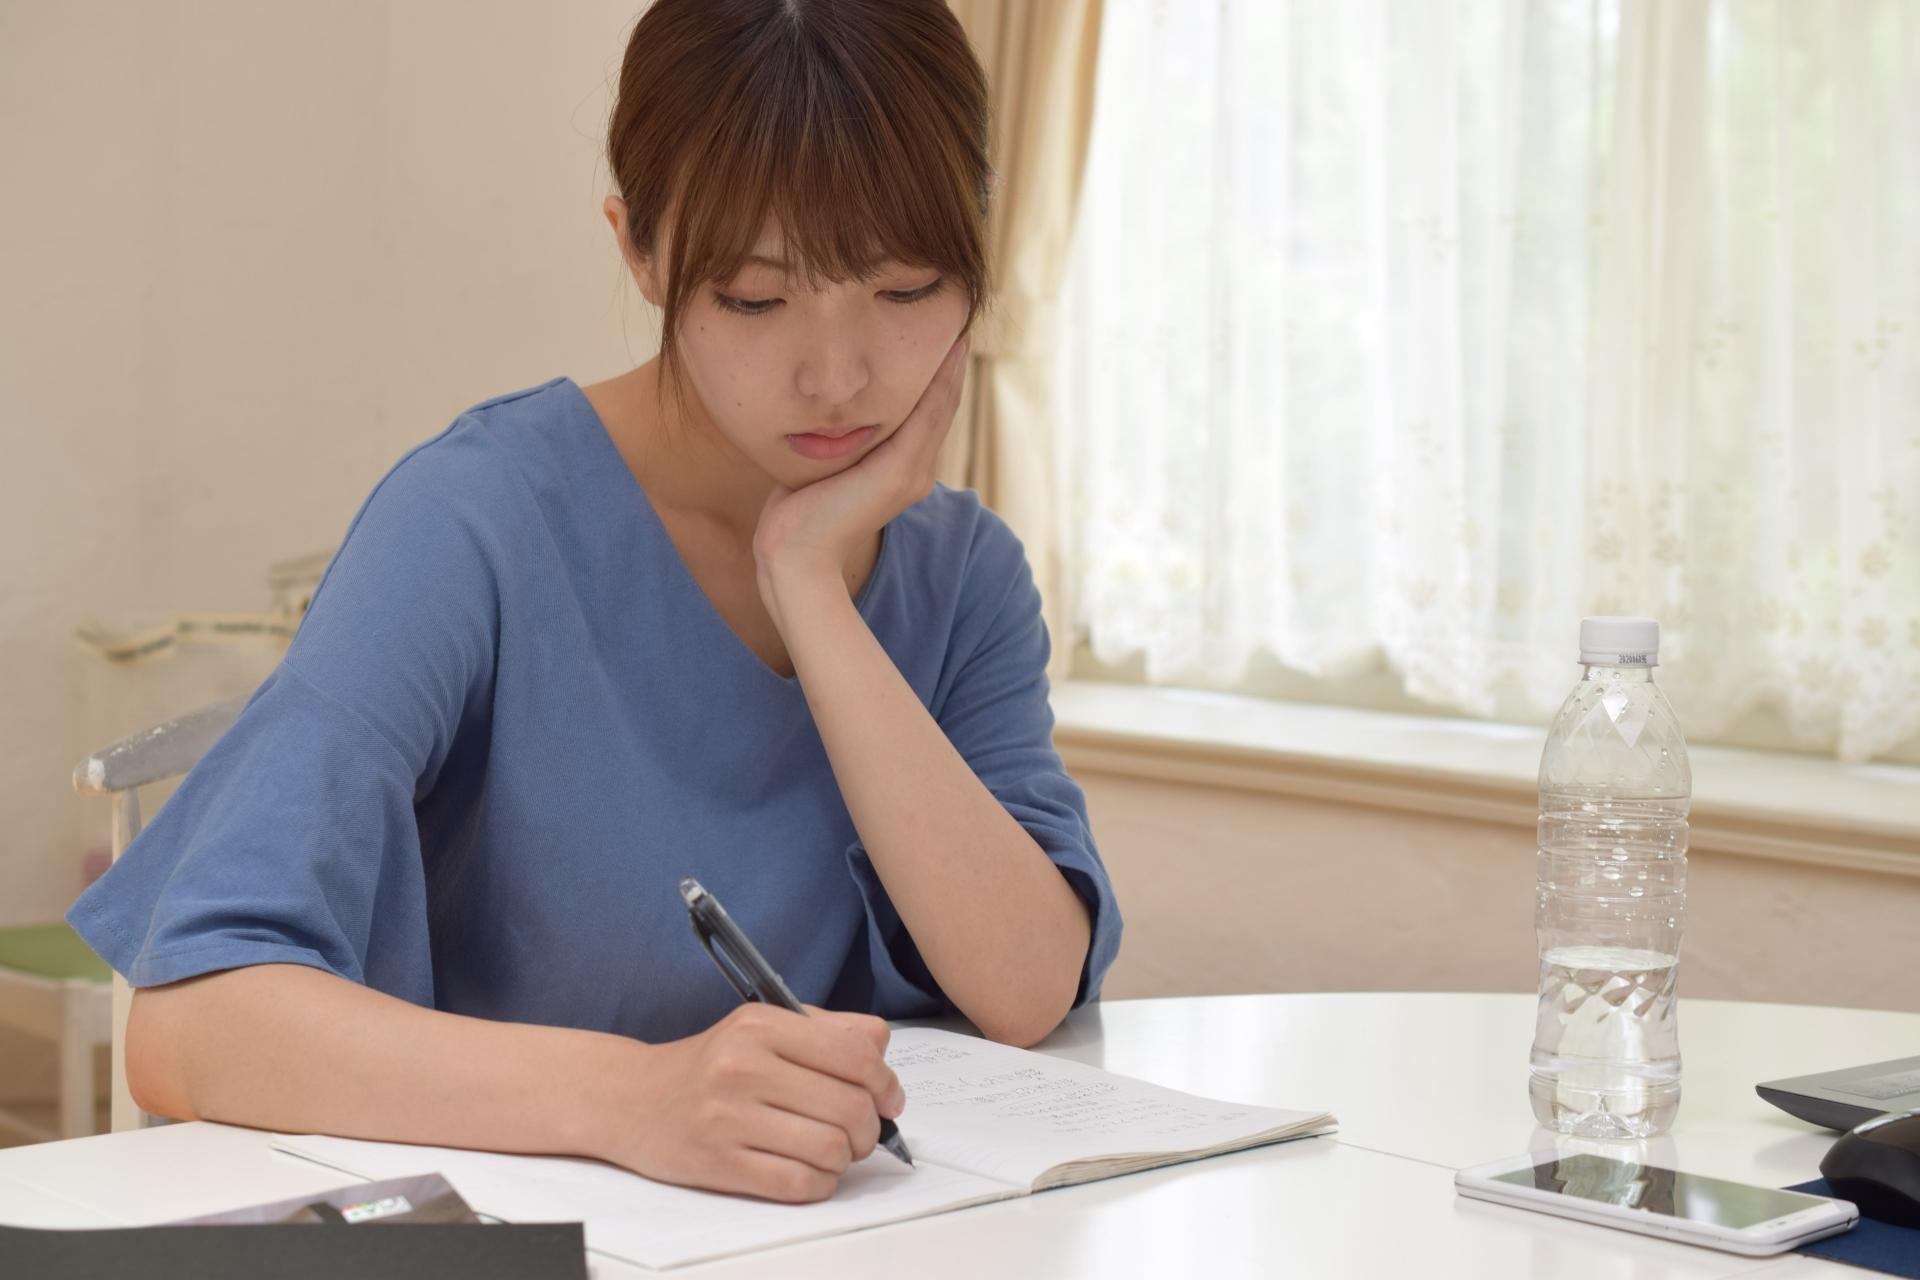 8020306e480e8441edba85f878ccaf79 m 社会保険労務士(社労士)の勉強時間の目安